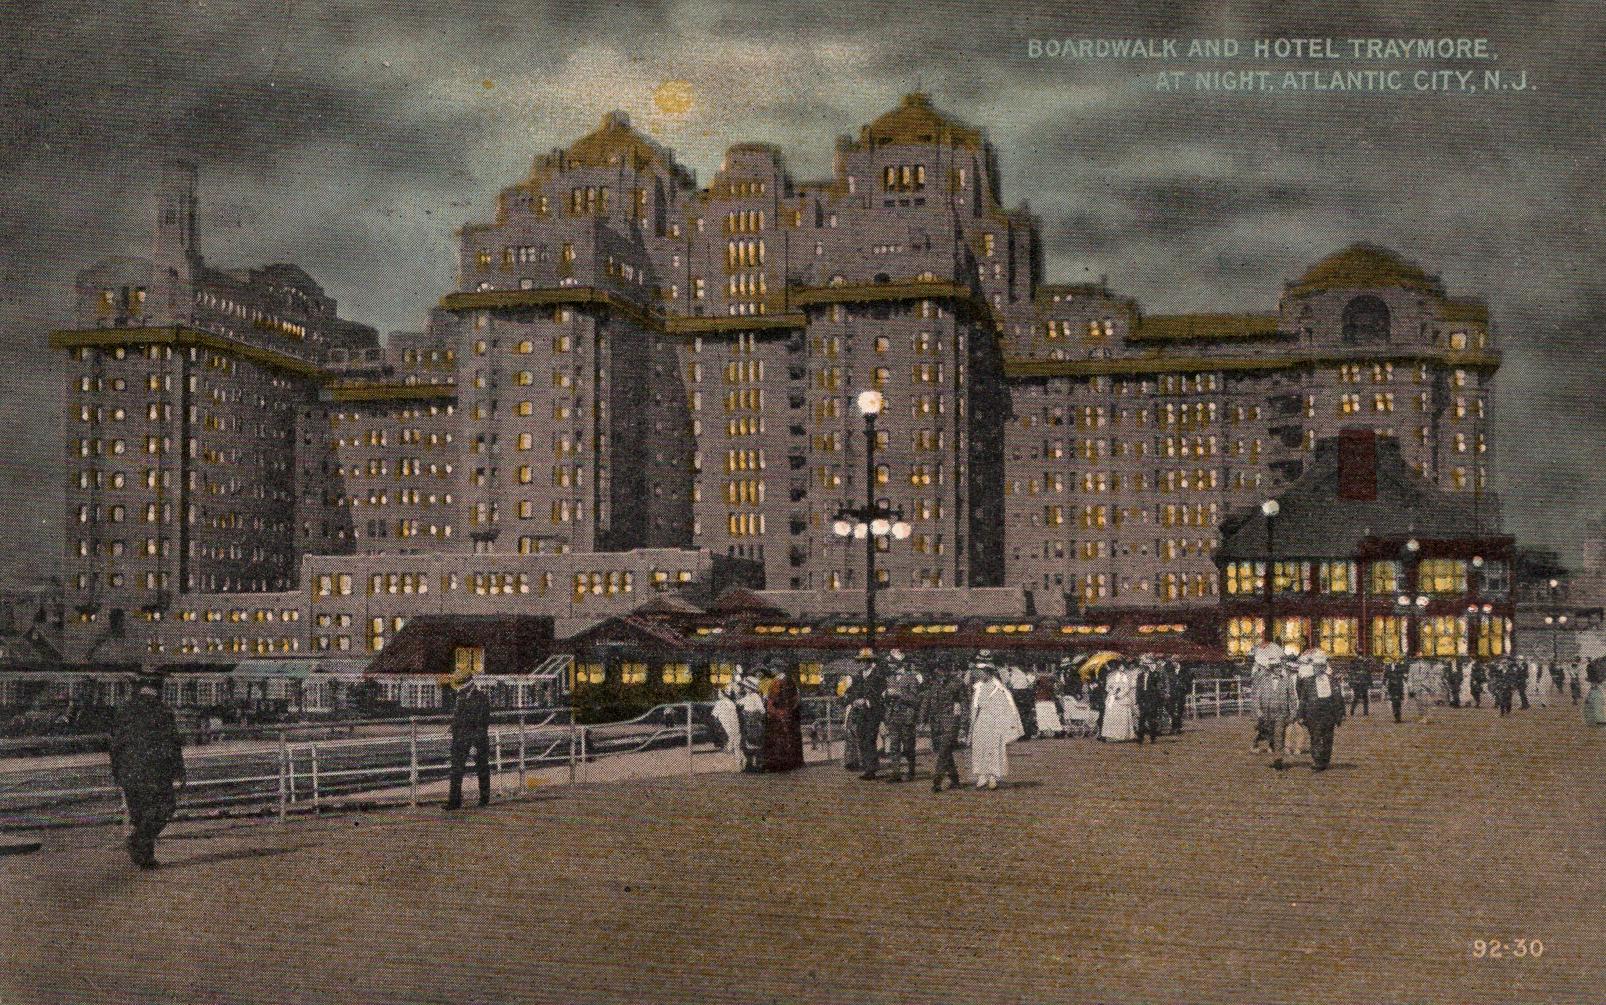 The Old Traymore Hotel Atlantic City Boardwalk Hotel Historic Hotels